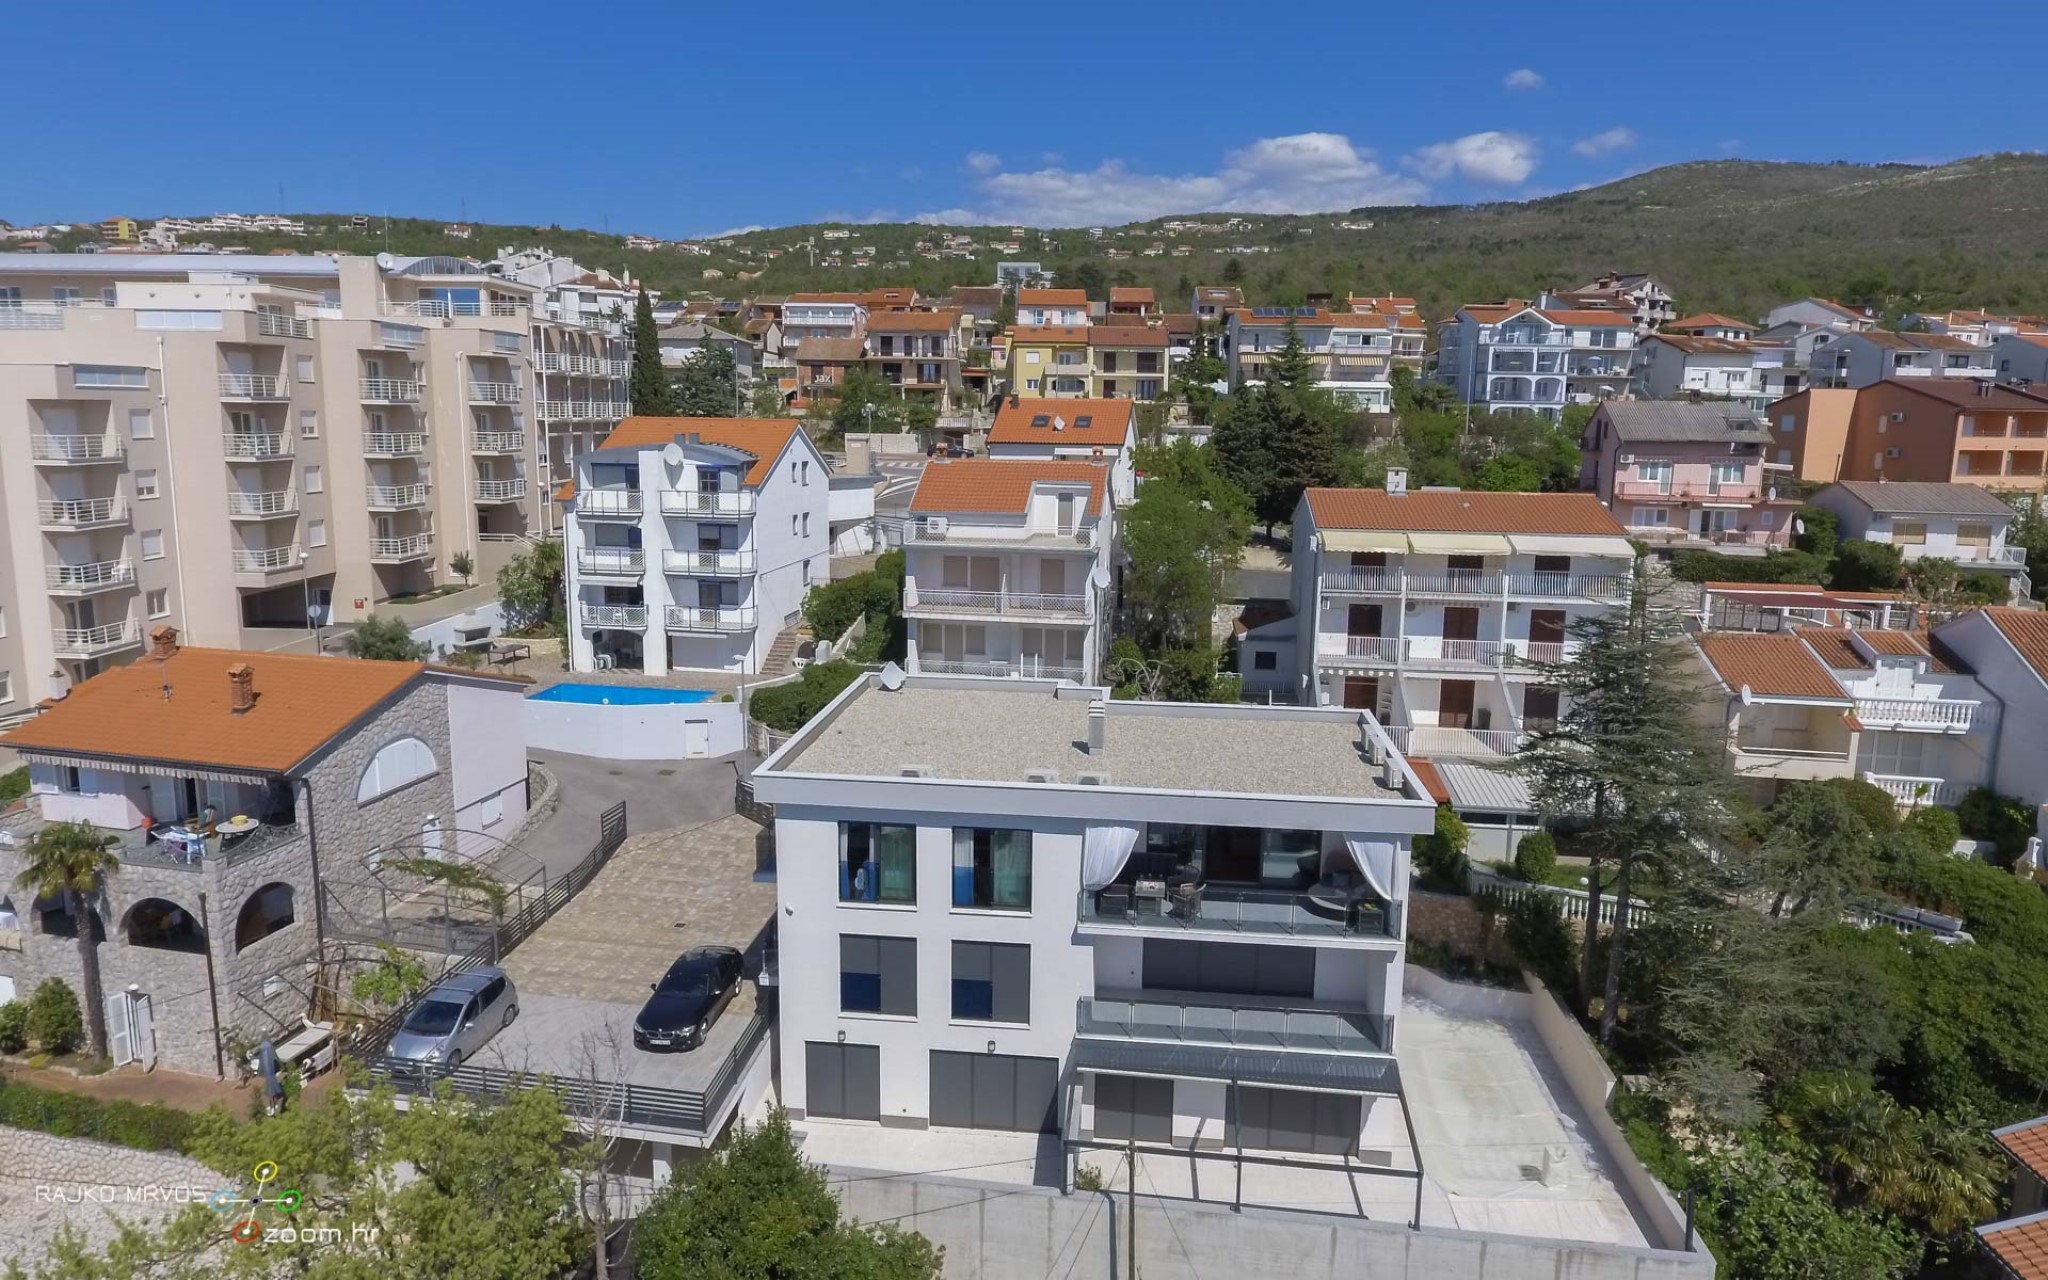 fotografiranje-iz-zraka-eksterijera-dronom-vila-kuca-hotela-apartmana-Larimar-Penthouse-54